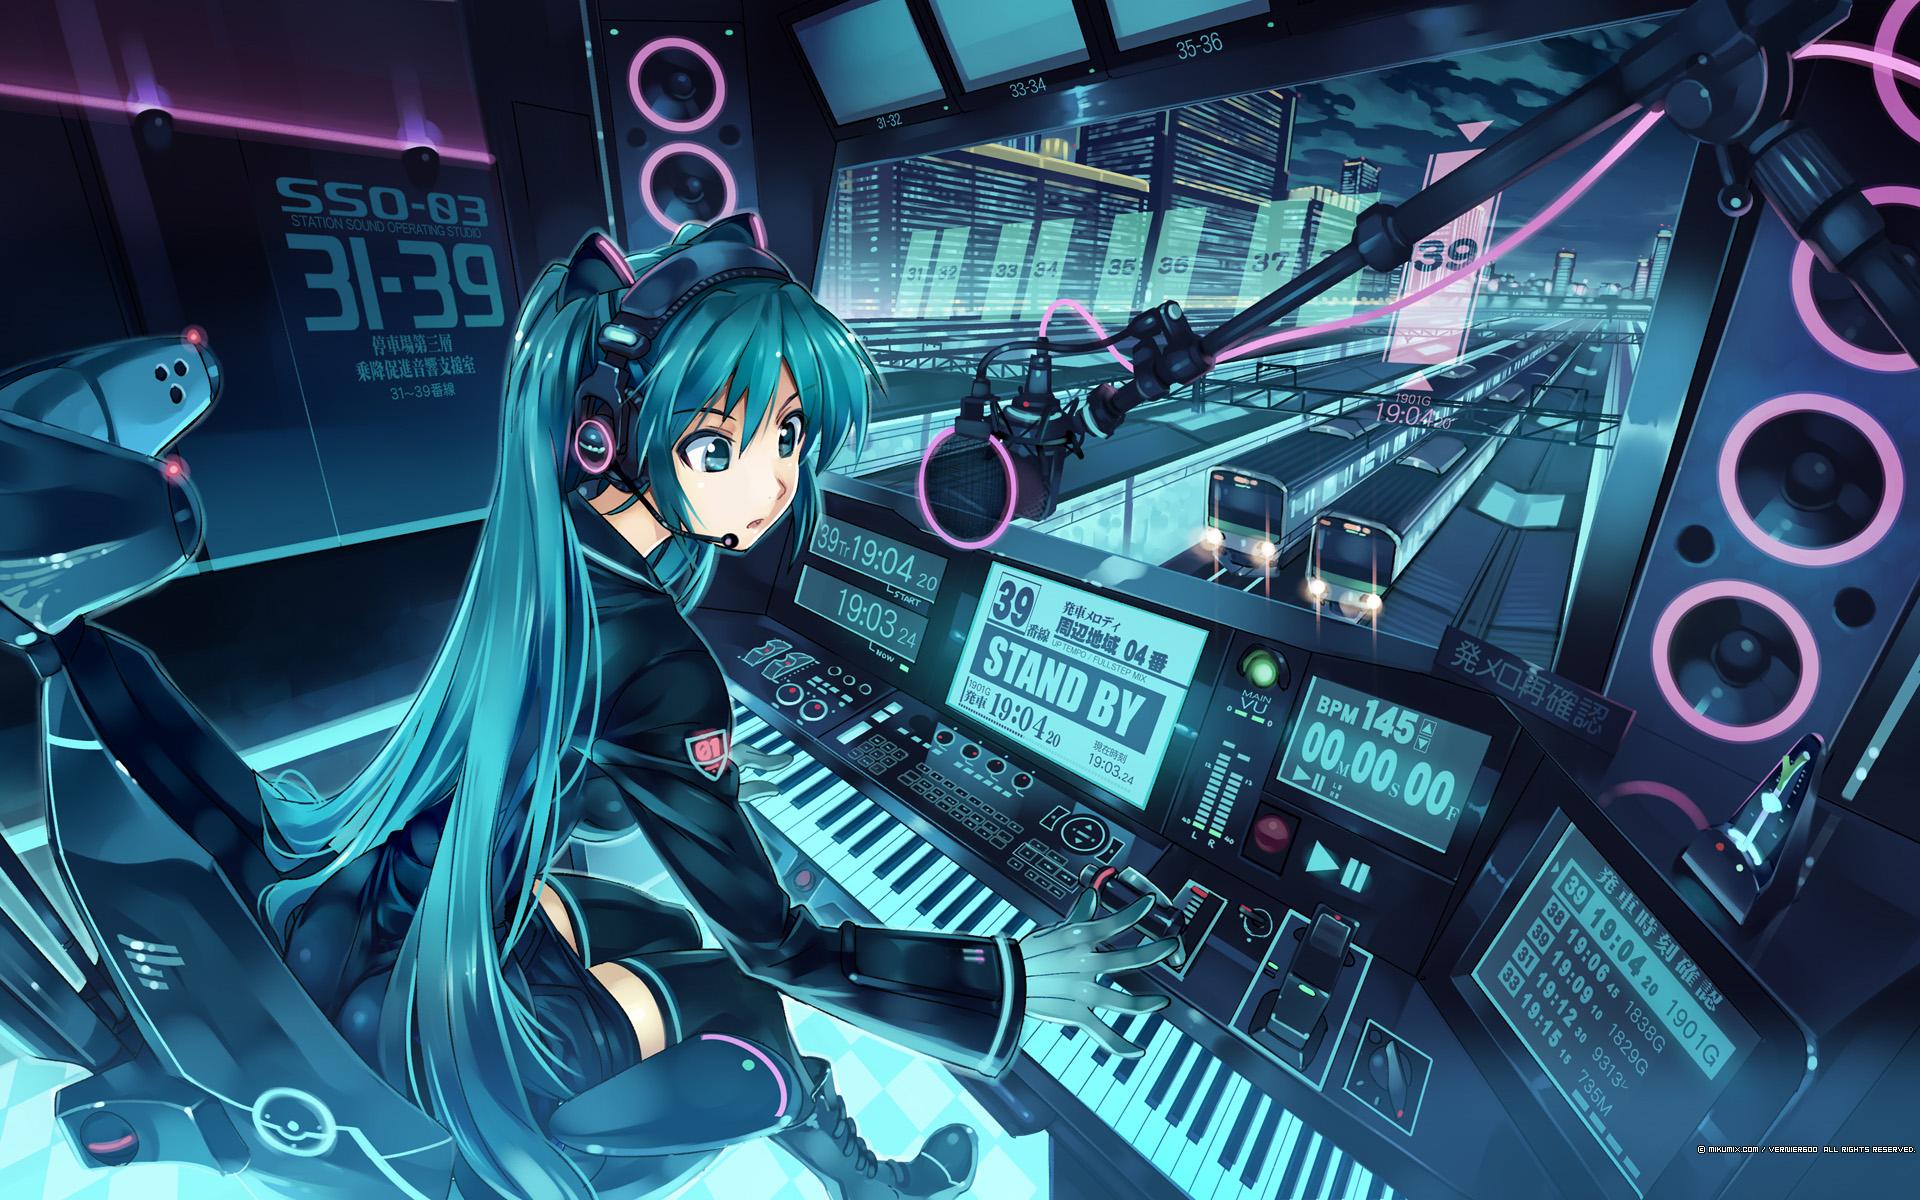 Anime Headphones Girl